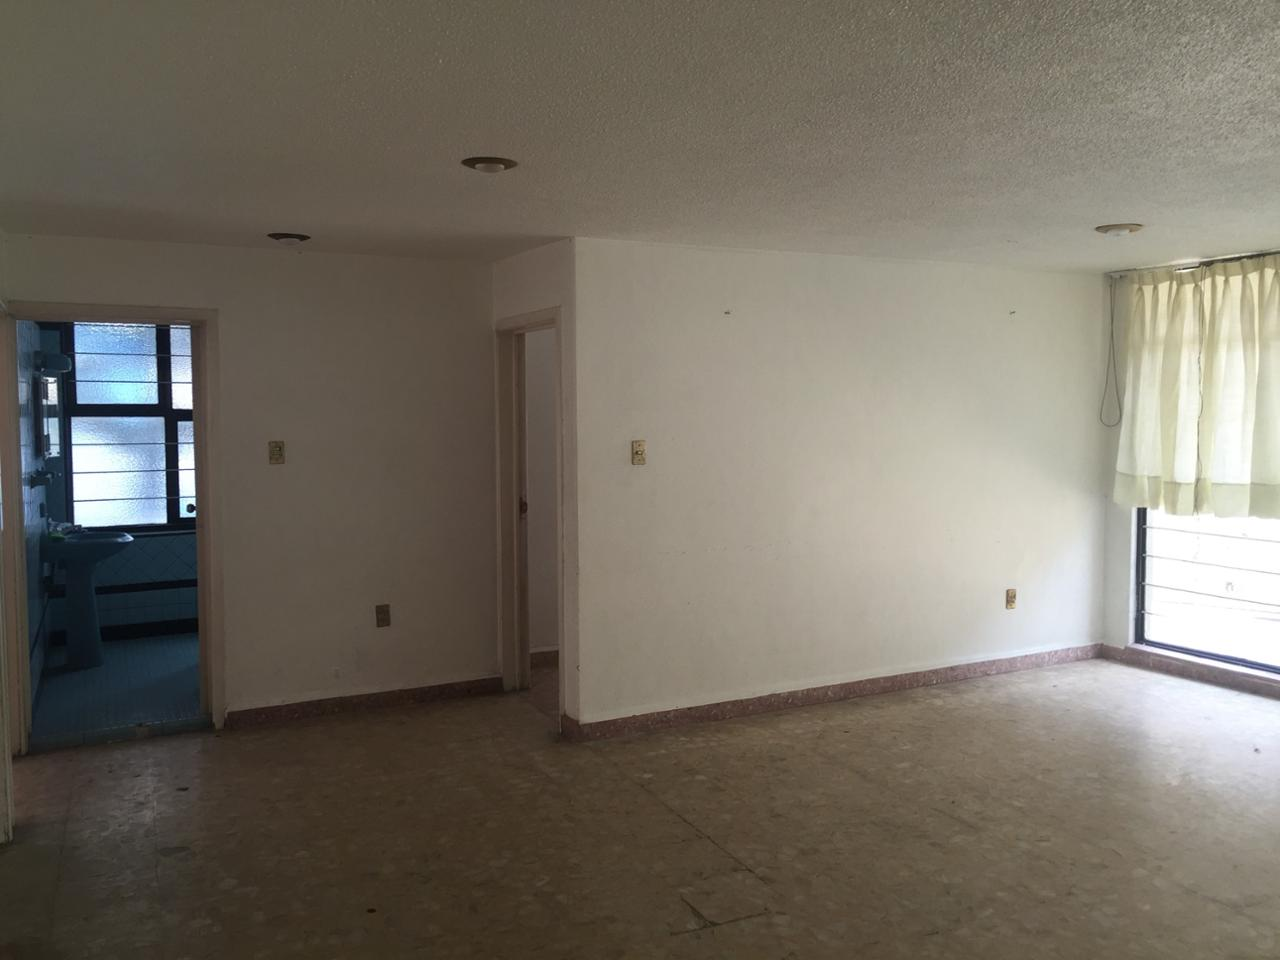 Casa uso de suelo en Venta Av.centenario 1900, Santiago Atzacoalco, Gustavo A. Madero, Distrito Federal, Ciudad De México, Distrito Federal (cdmx)